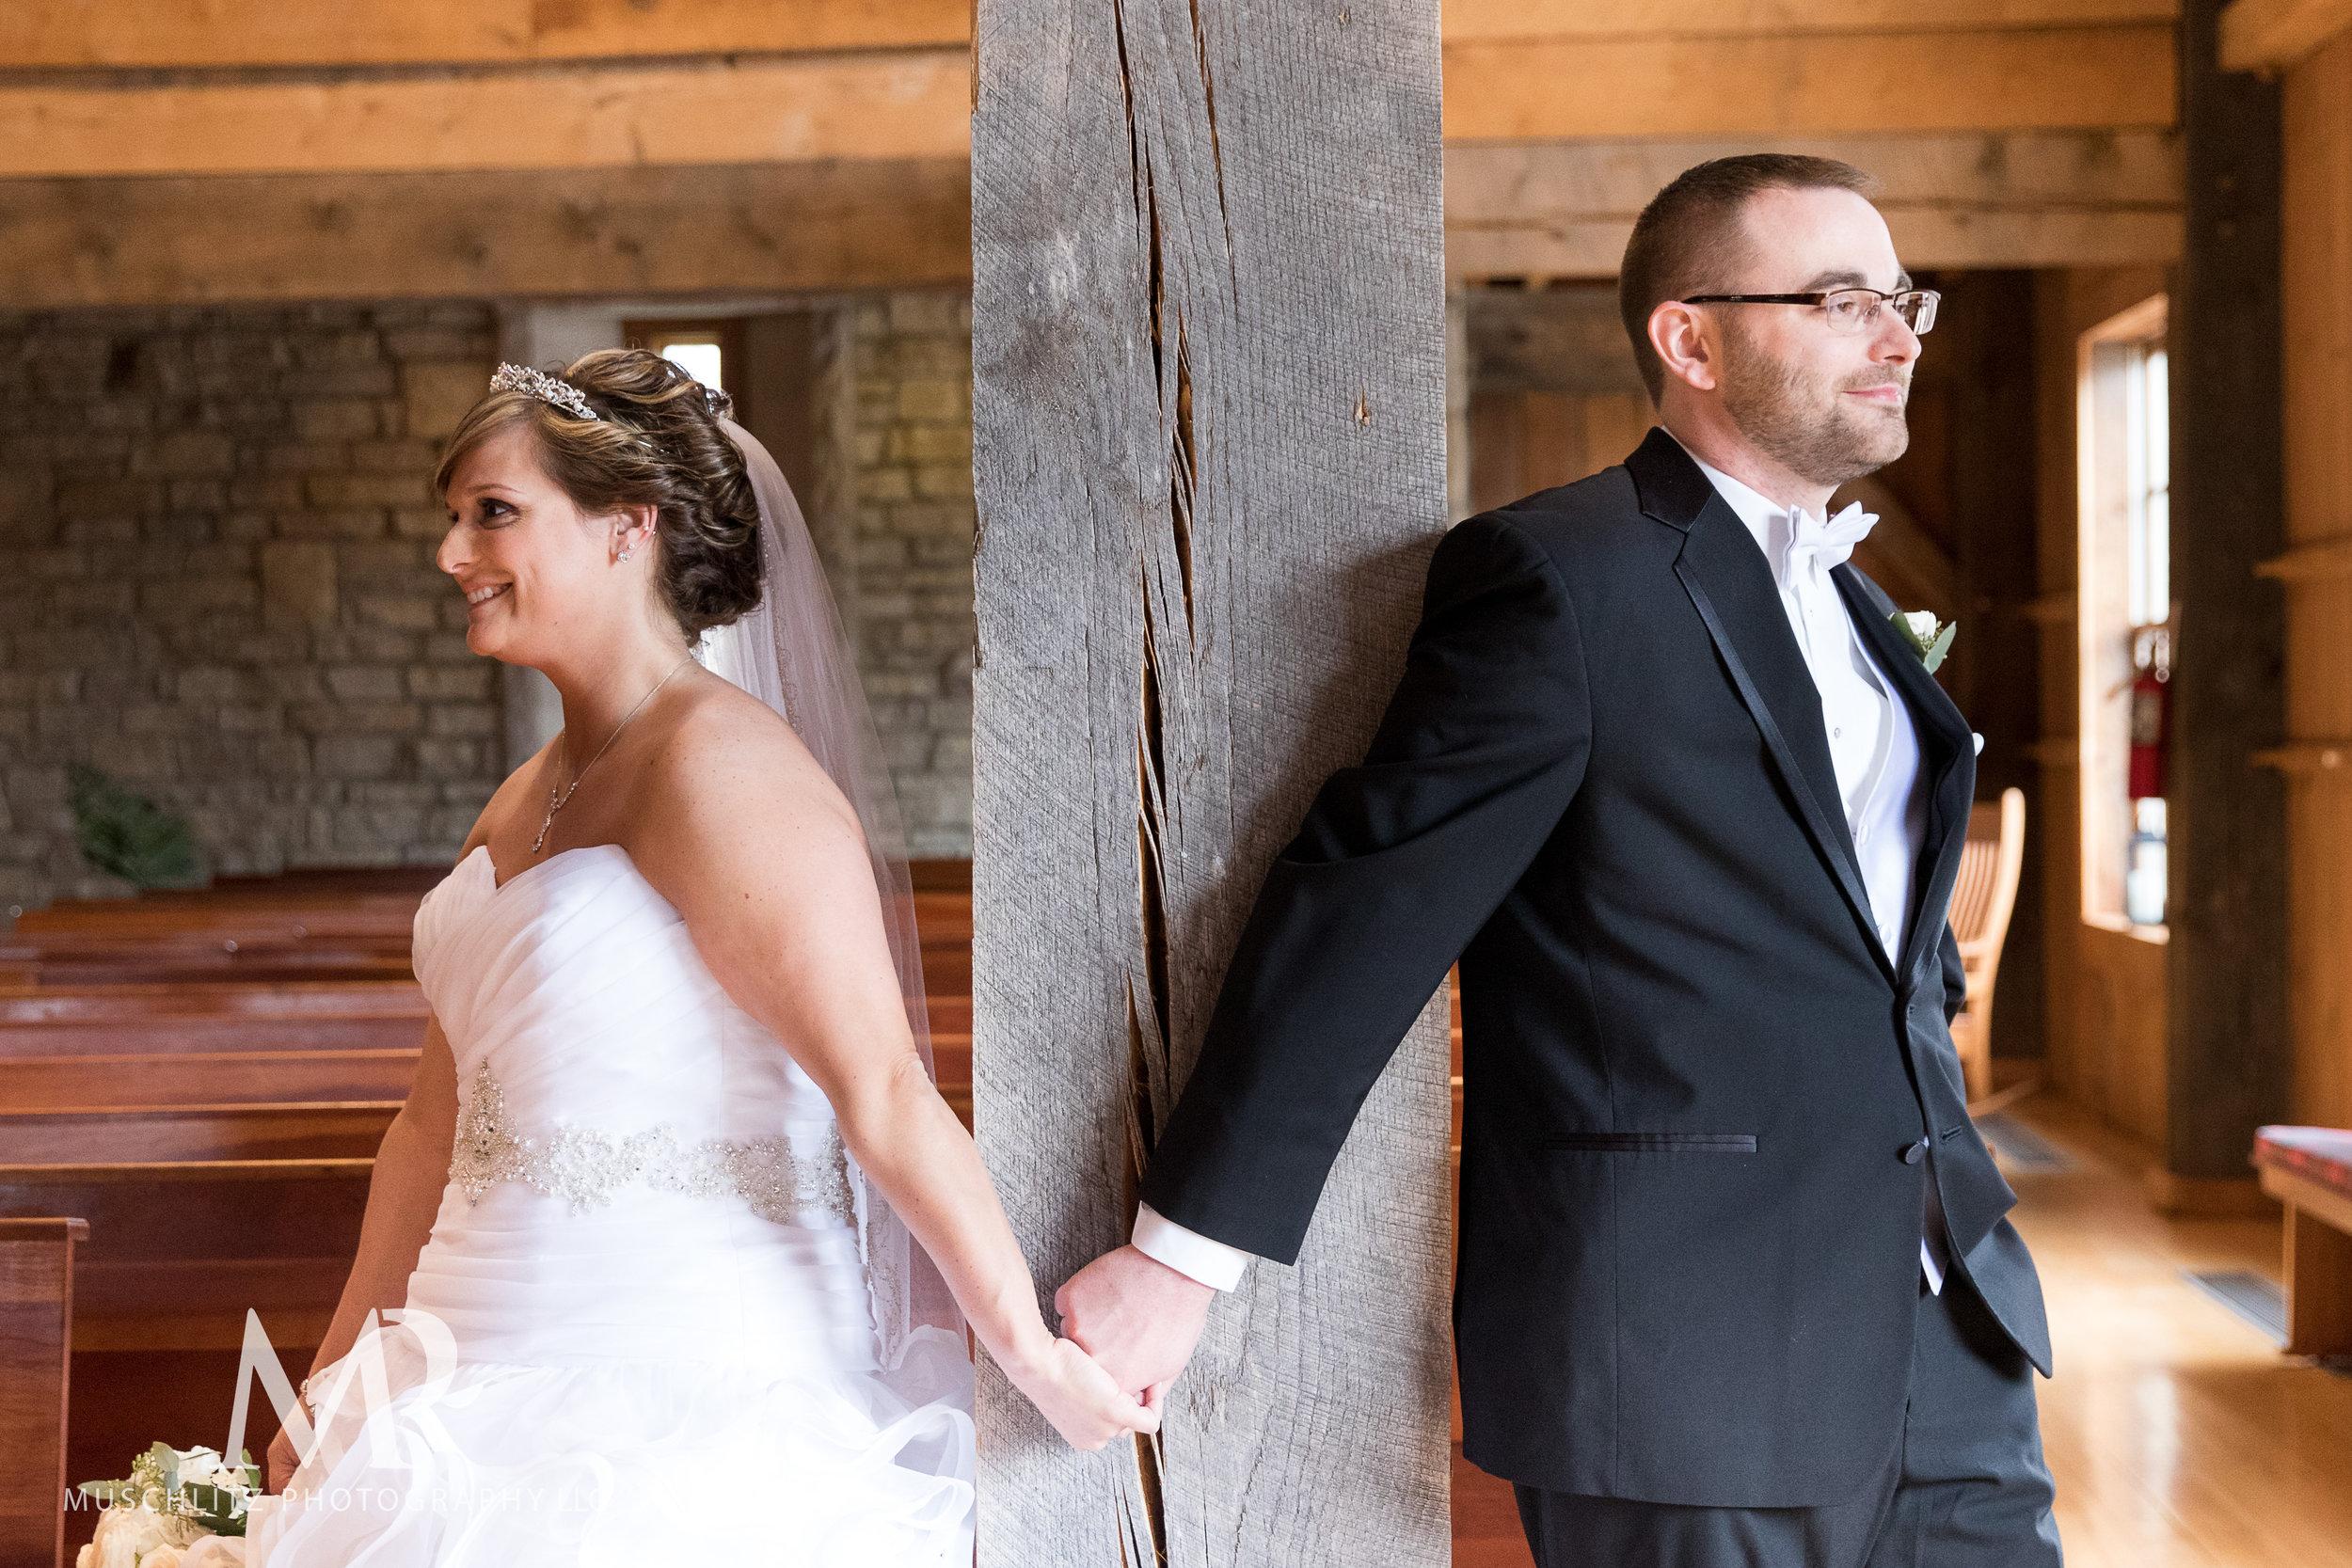 liberty-barn-presbyterian-church-wedding-delaware-columbus-ohio-muschlitz-photography-017.JPG